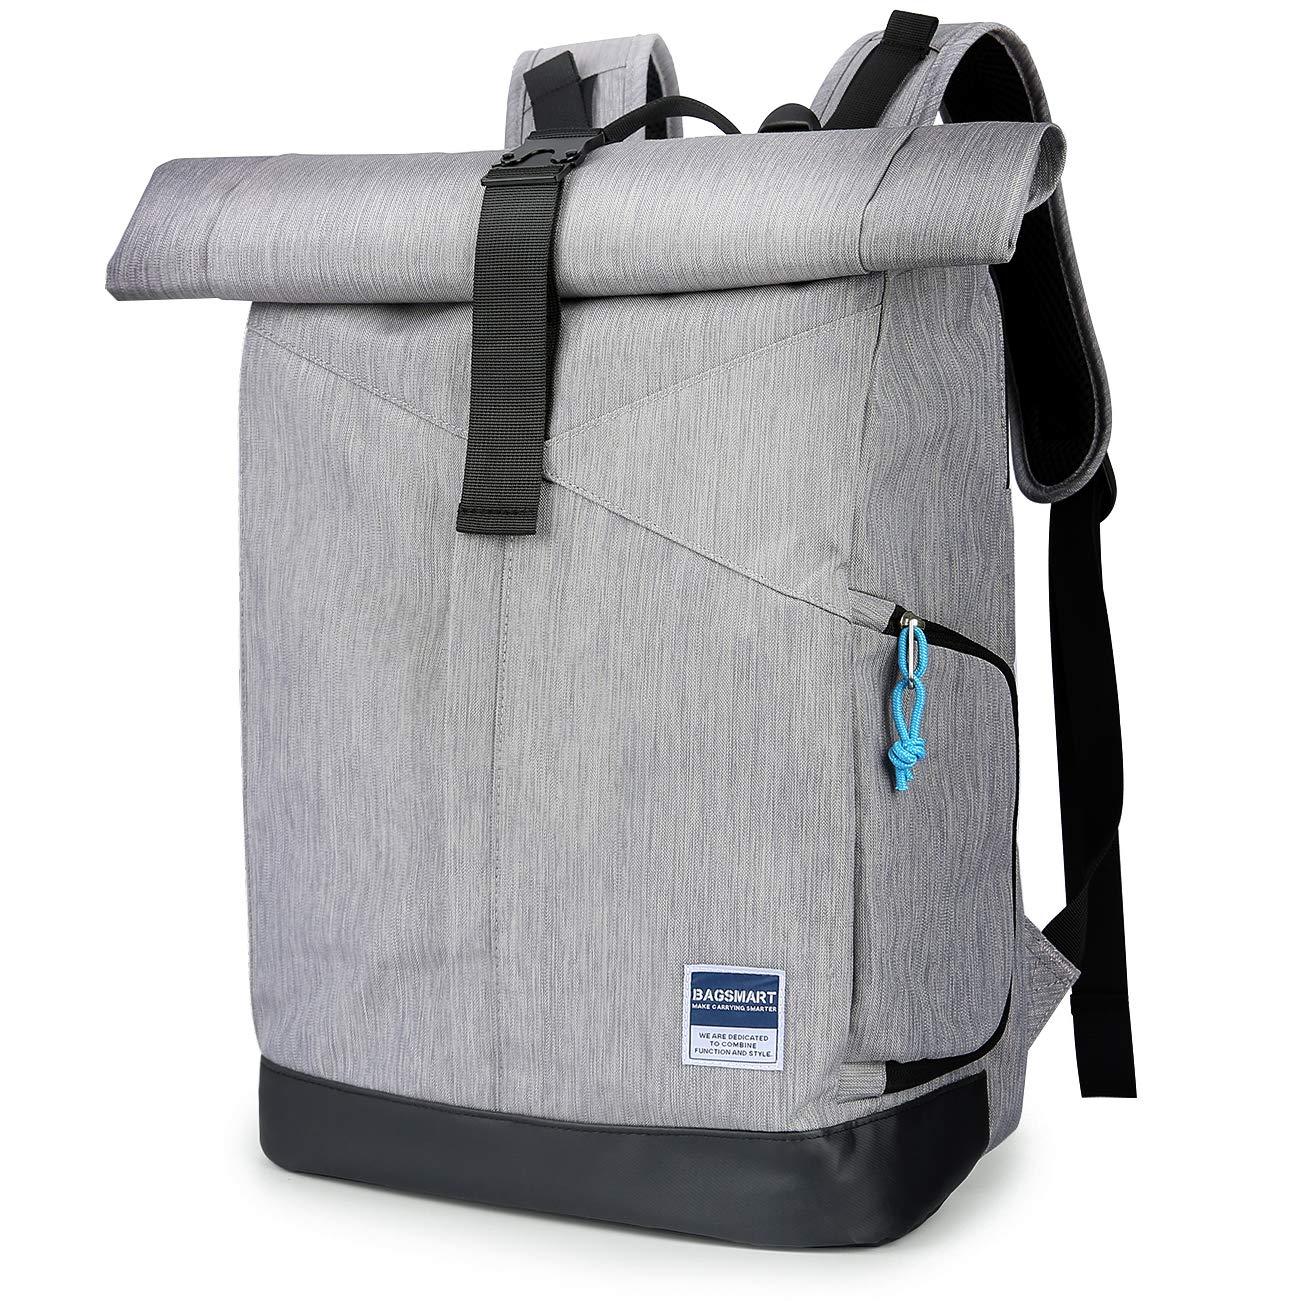 BAGSMART Laptop Rucksack 15.6 Zoll Notebook Reise Backpack Modern Daypack Aktentasche